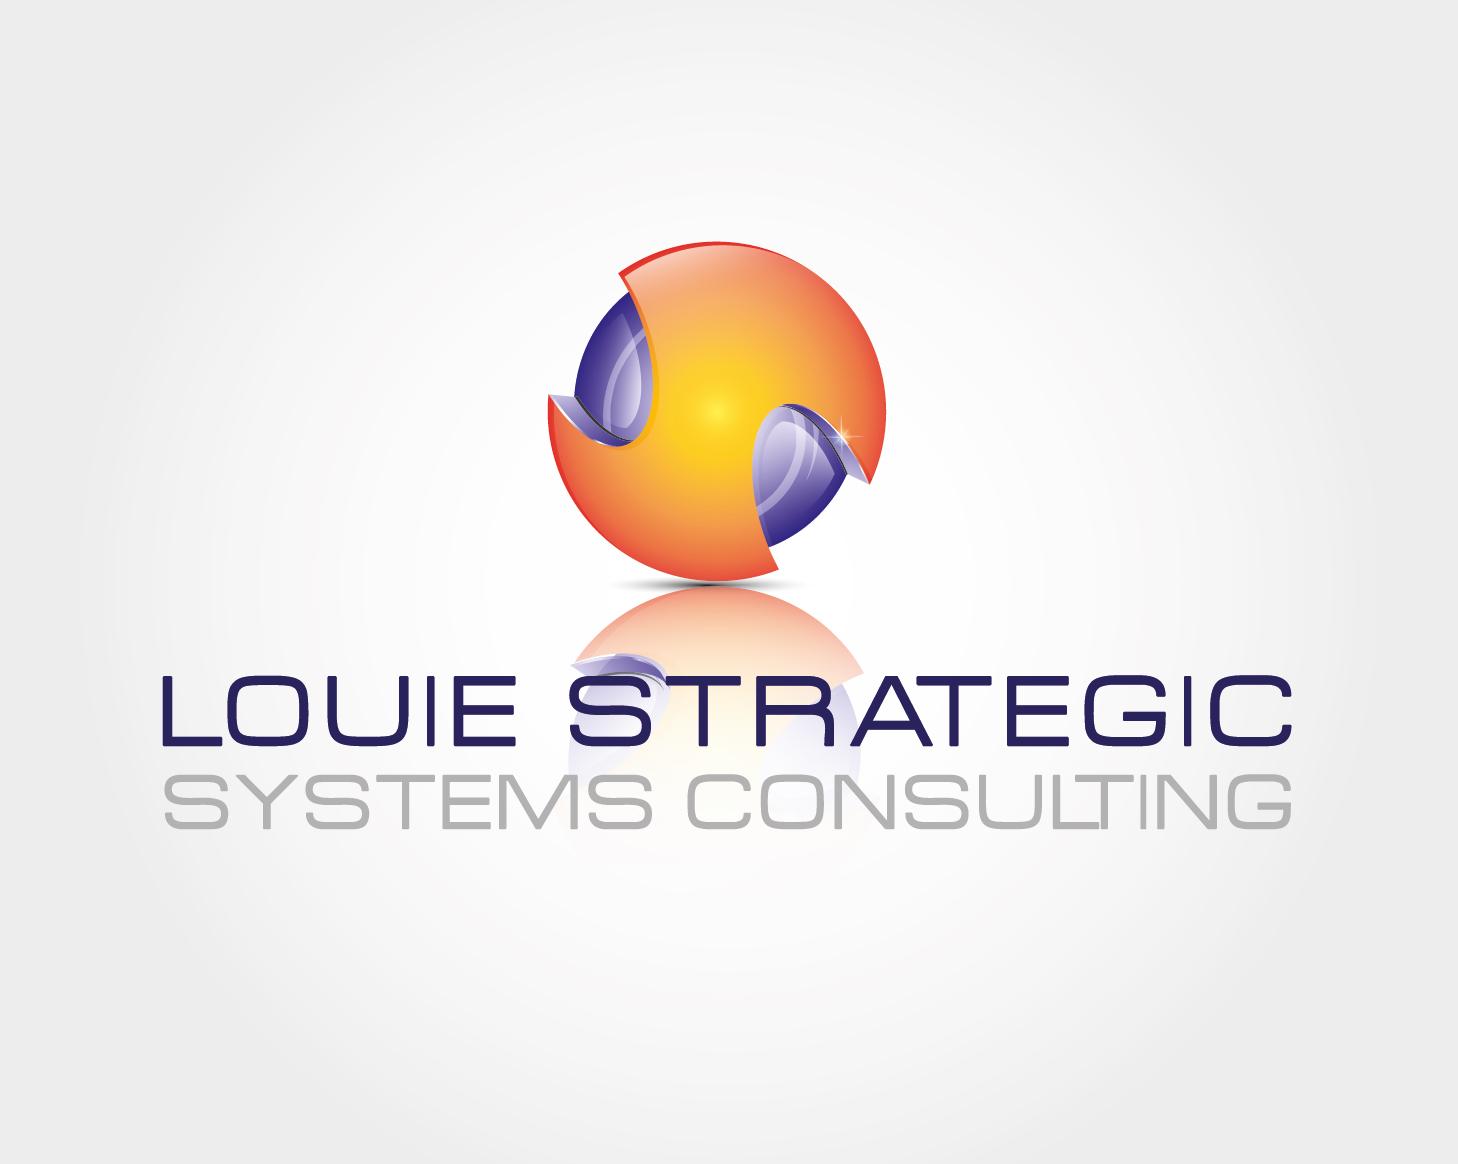 Logo Design by VENTSISLAV KOVACHEV - Entry No. 35 in the Logo Design Contest Artistic Logo Design for Louie Strategic Systems Consulting.